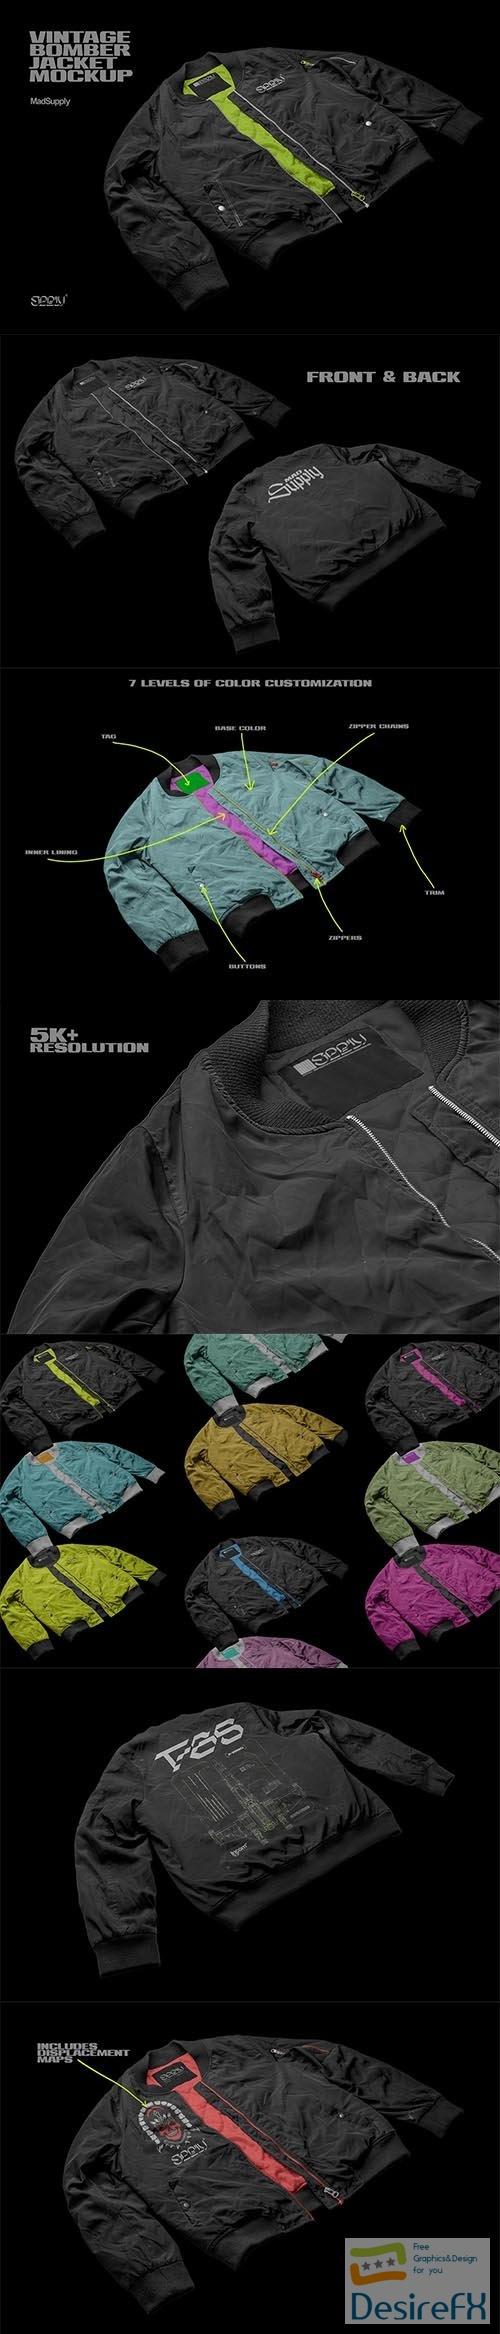 CreativeMarket - Vintage Bomber Jacket Mockup 5917217